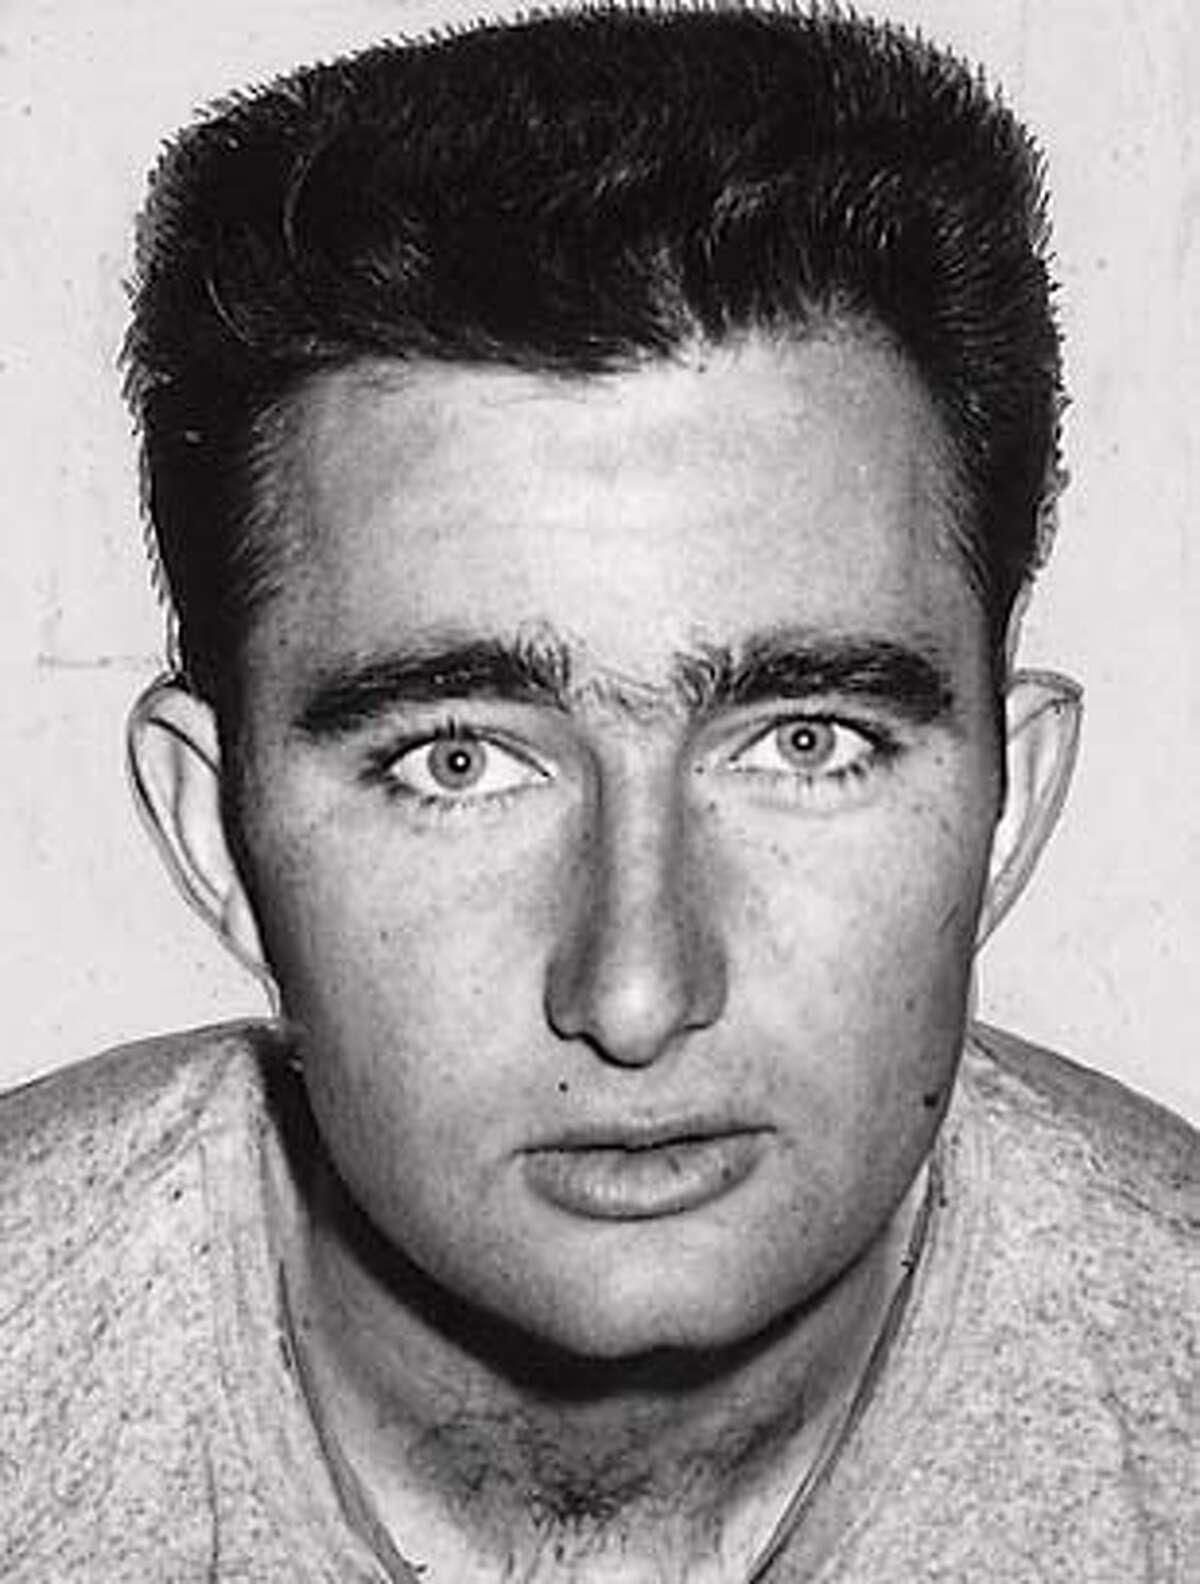 University of San Francisco Basketball Team - 1957 Mike Farmer, center Dated JAN 15, 1957